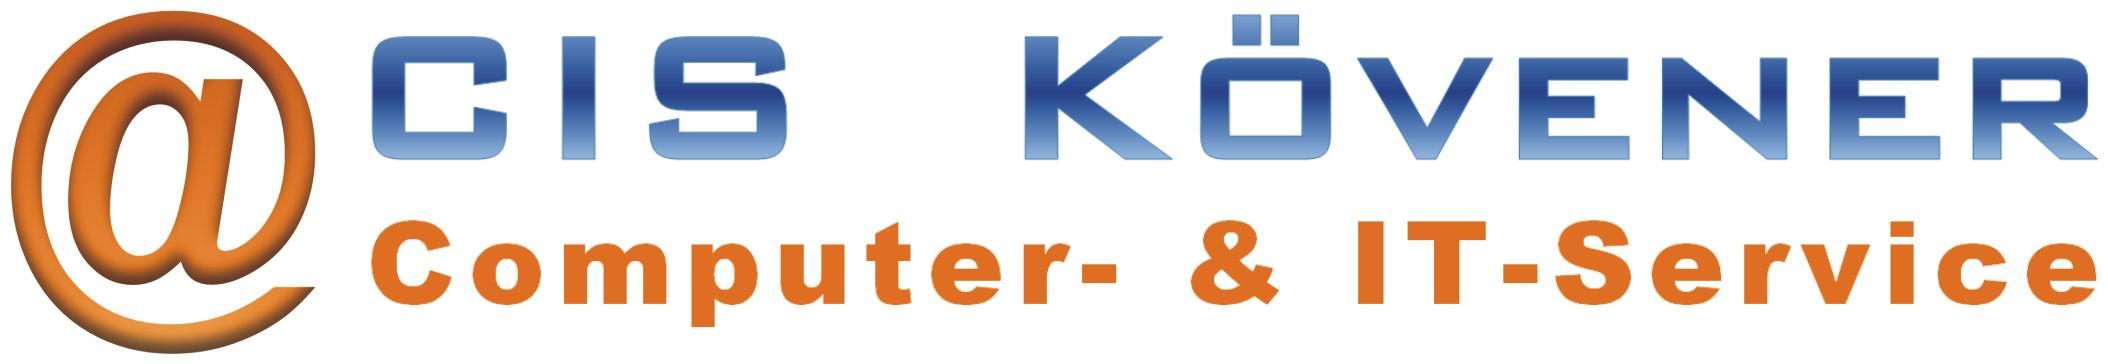 CIS Kövener Computer- & IT-Service in Münster